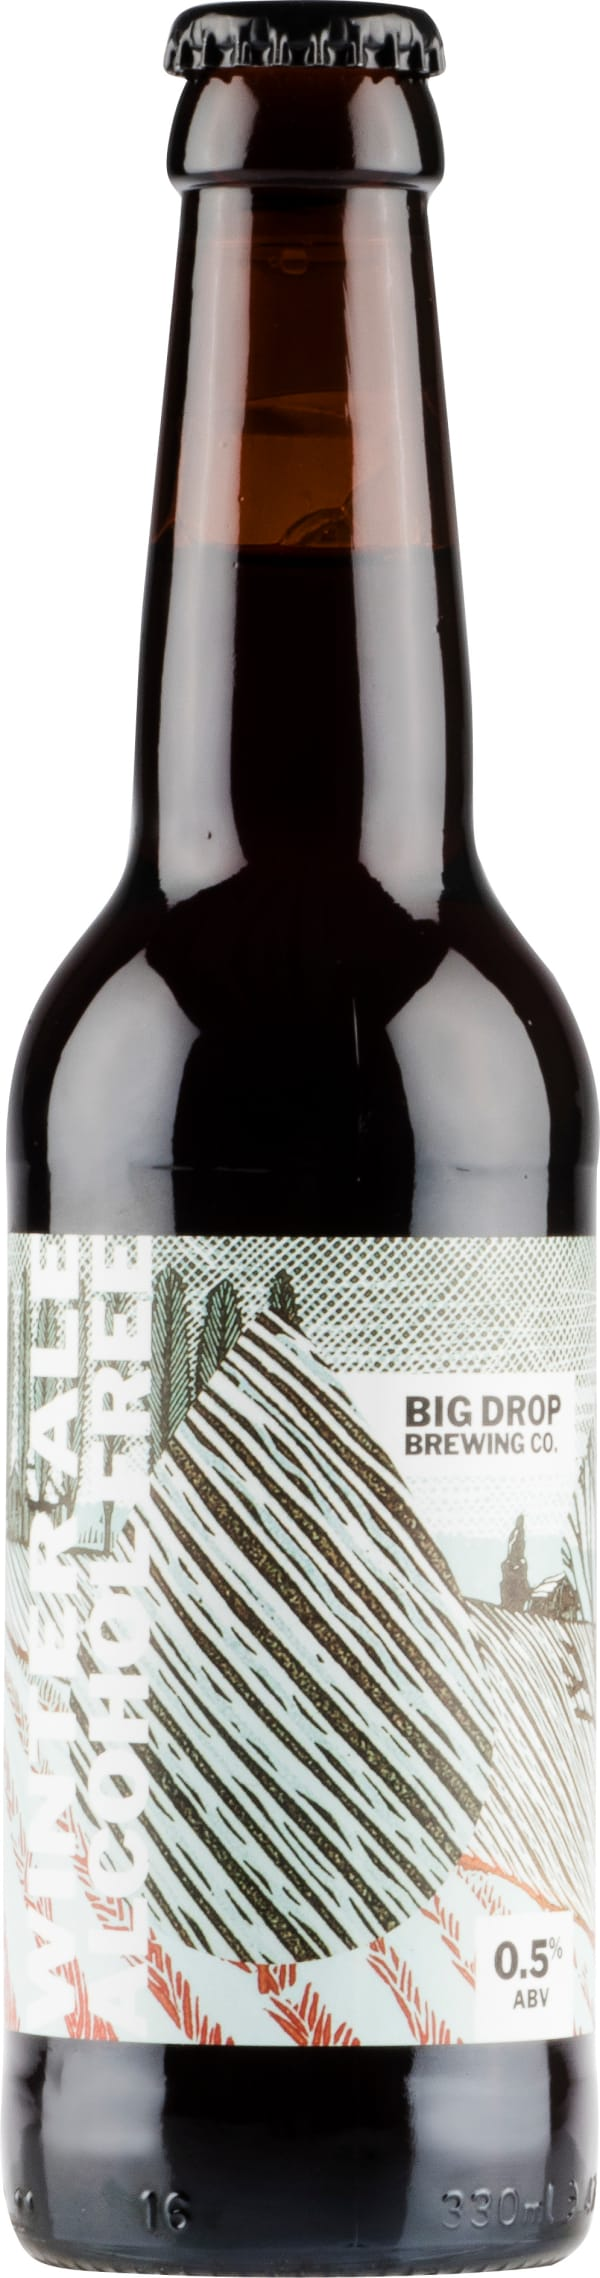 Big Drop Spiced Ale